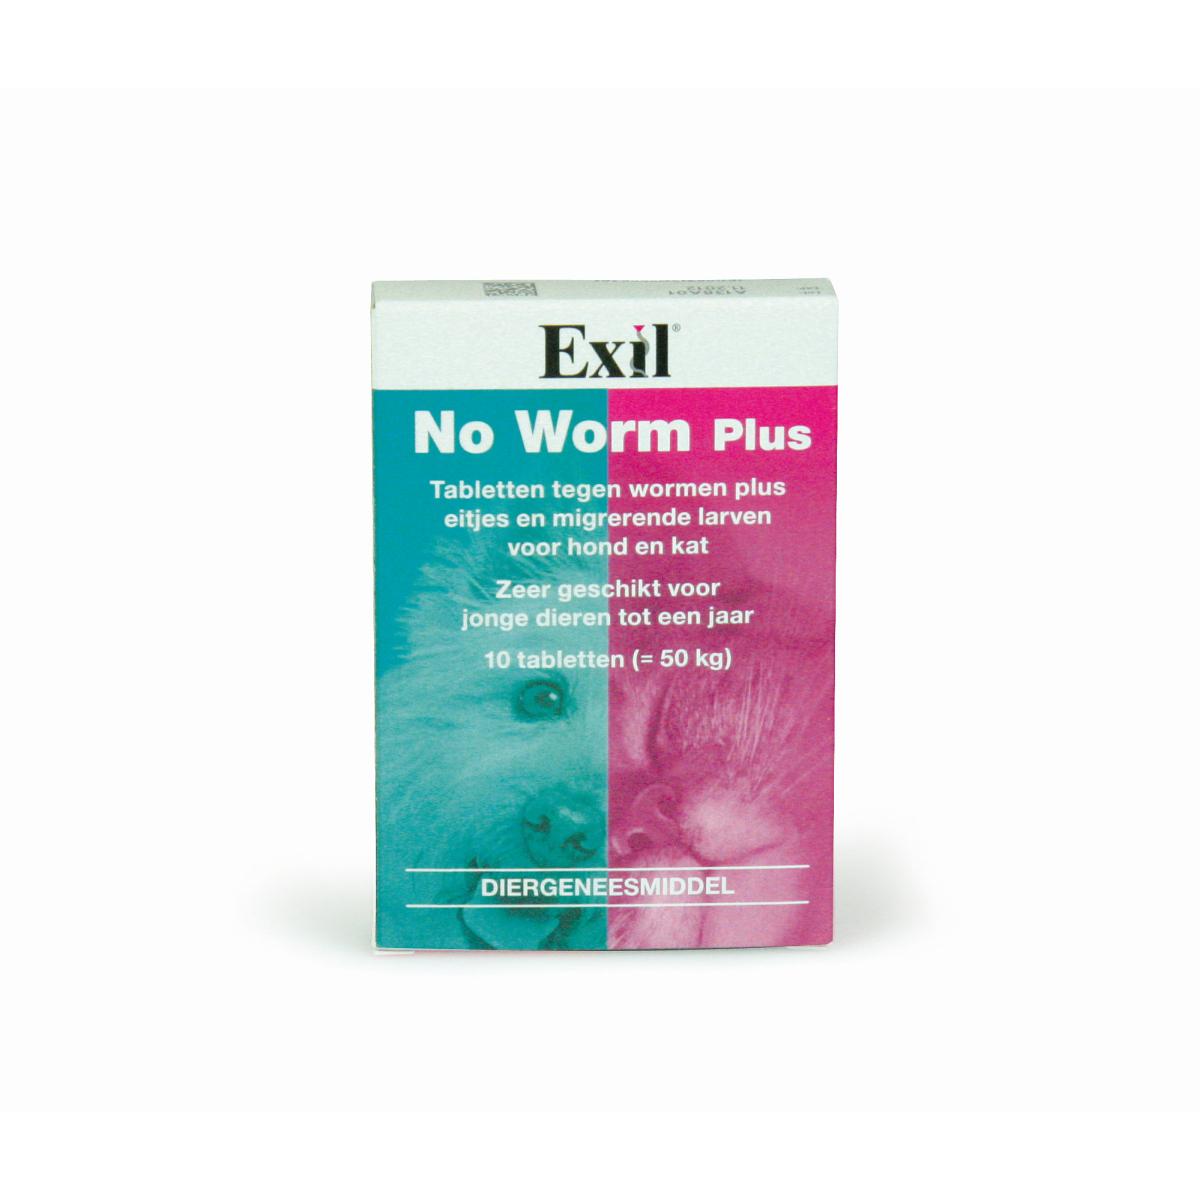 No worm plus hond&kat blauw/roze 10 tabl